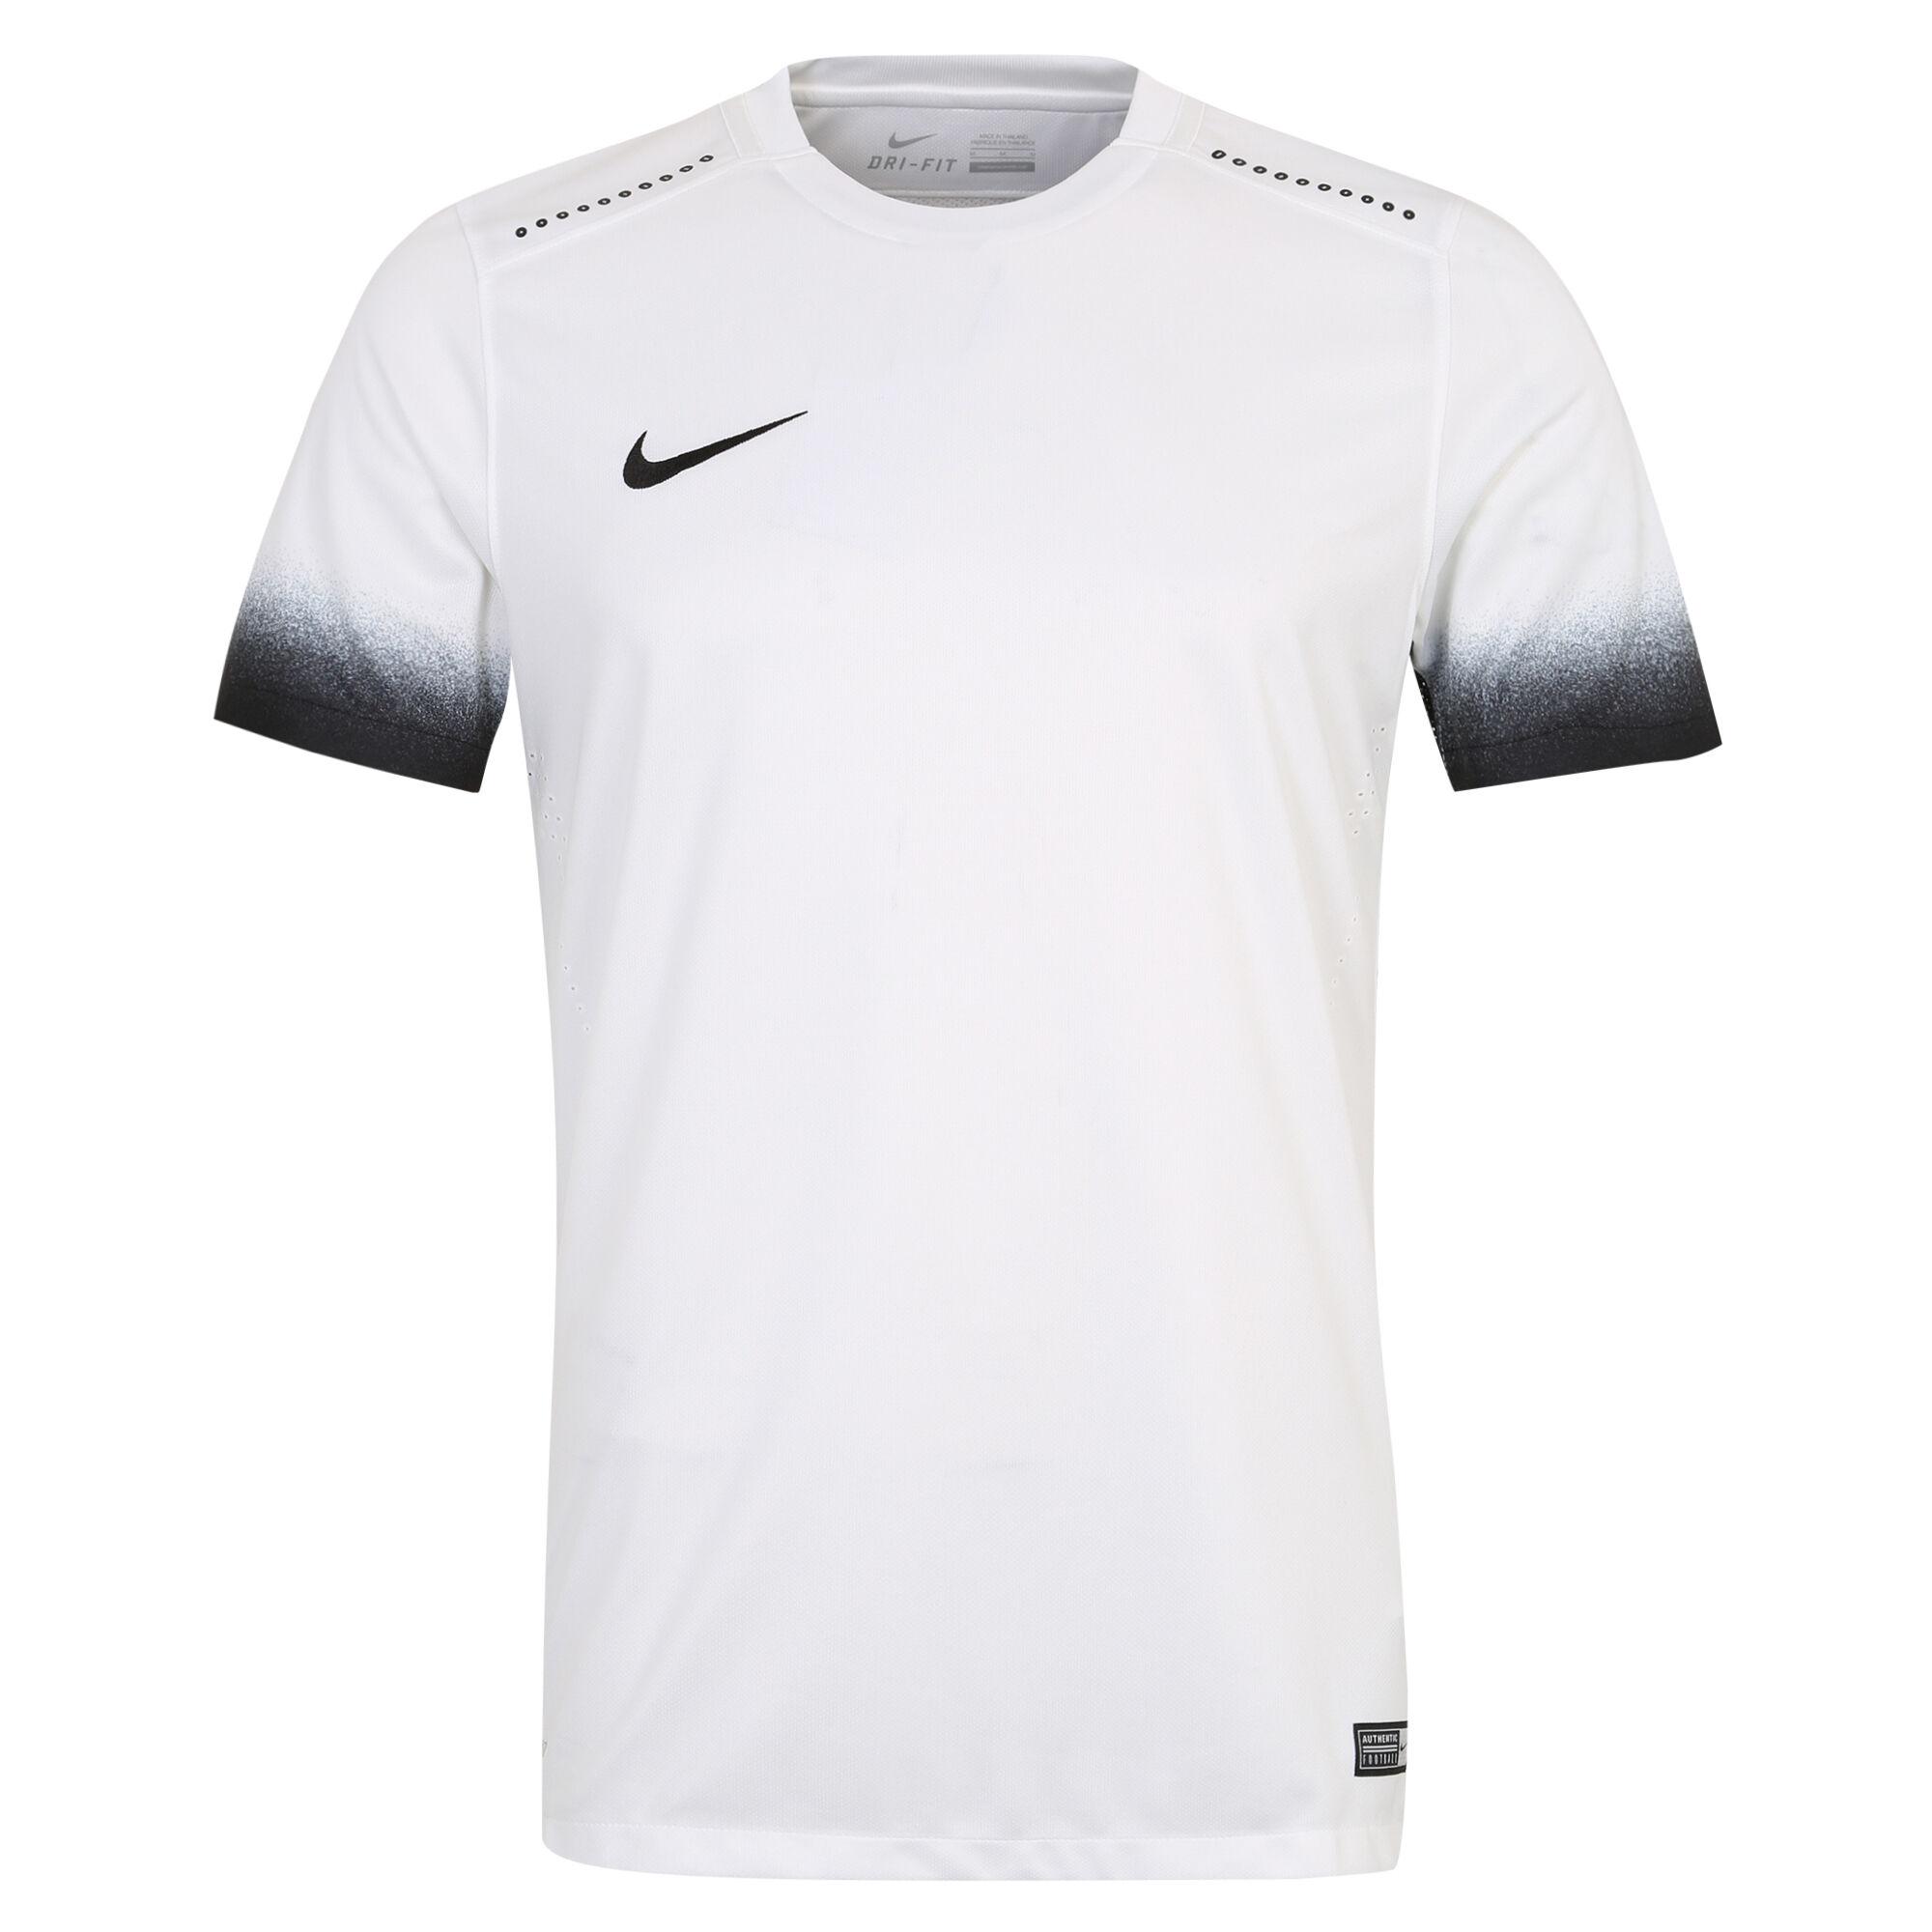 ... Laser Print III Fußballtrikot Herren, Weiß, zoom bei OUTFITTER Online  ...